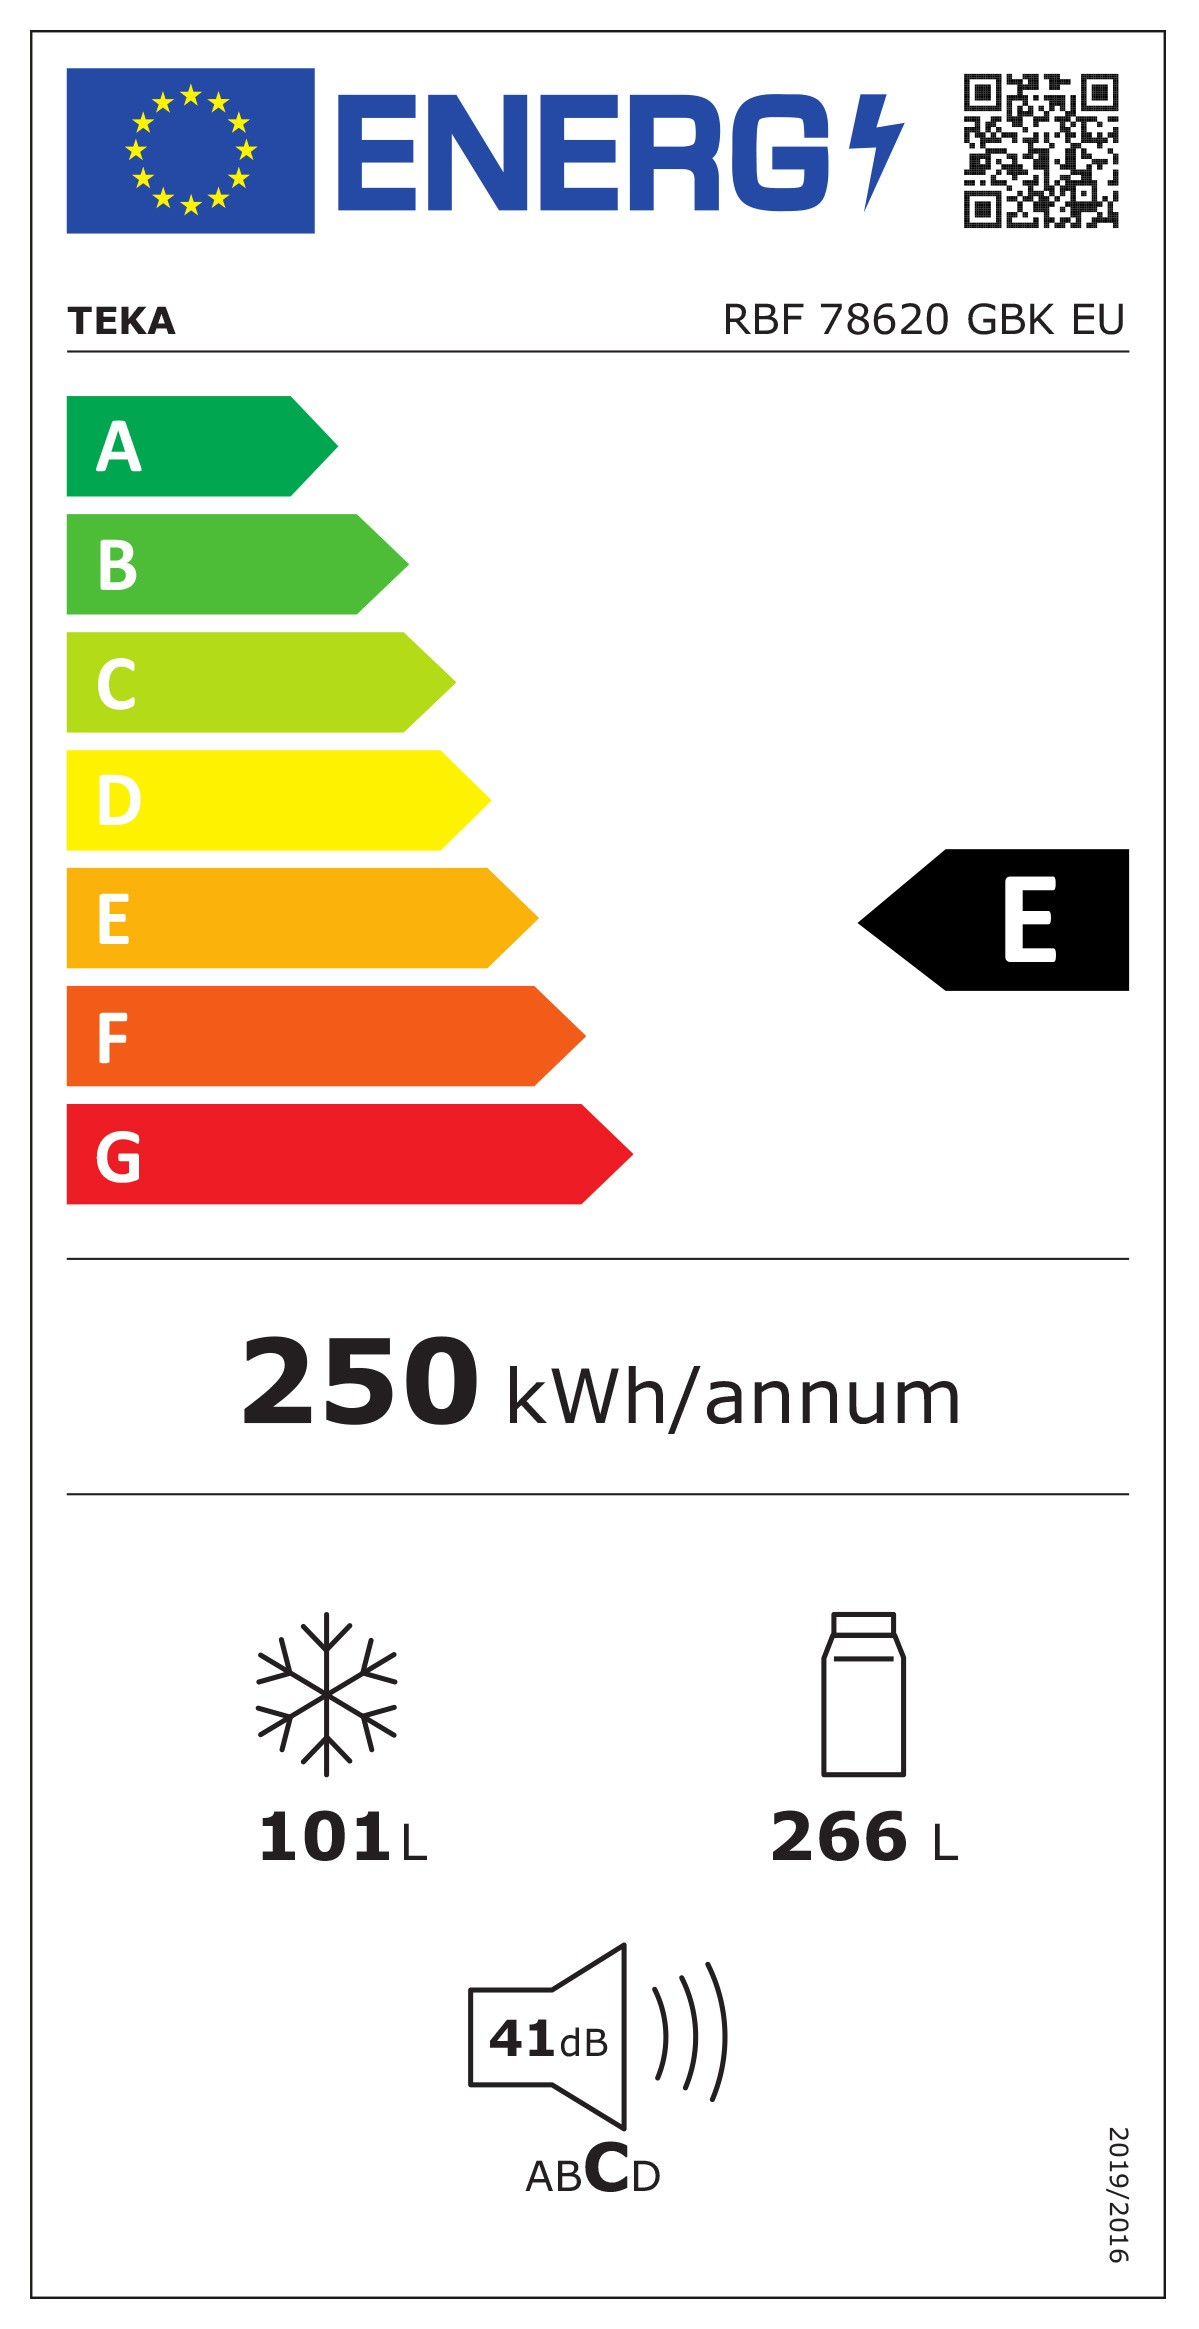 Etiqueta de Eficiencia Energética - 113400006